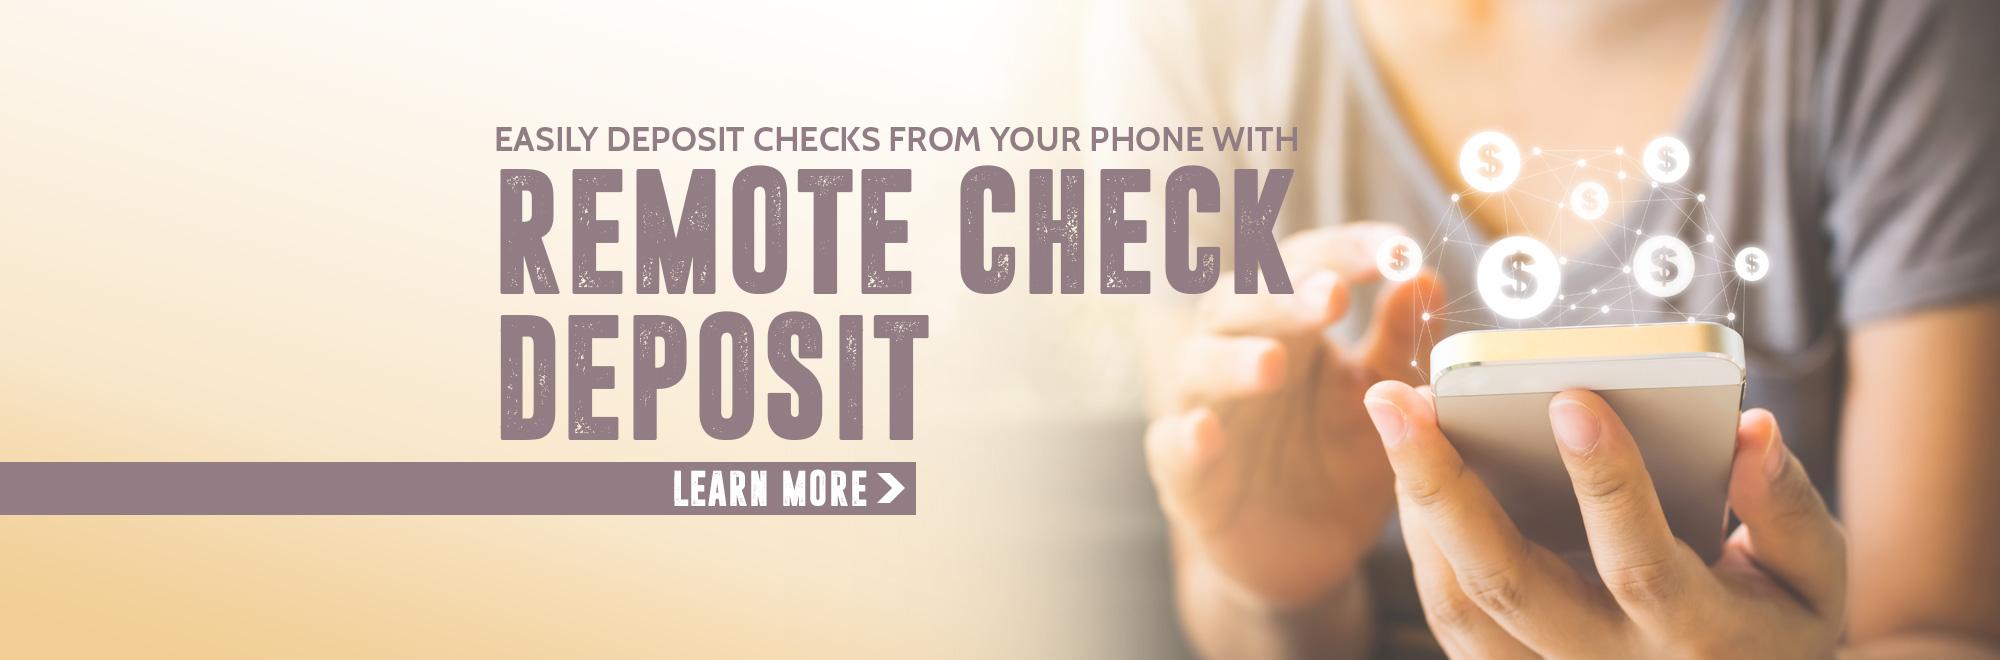 Remote Check Deposit Banner